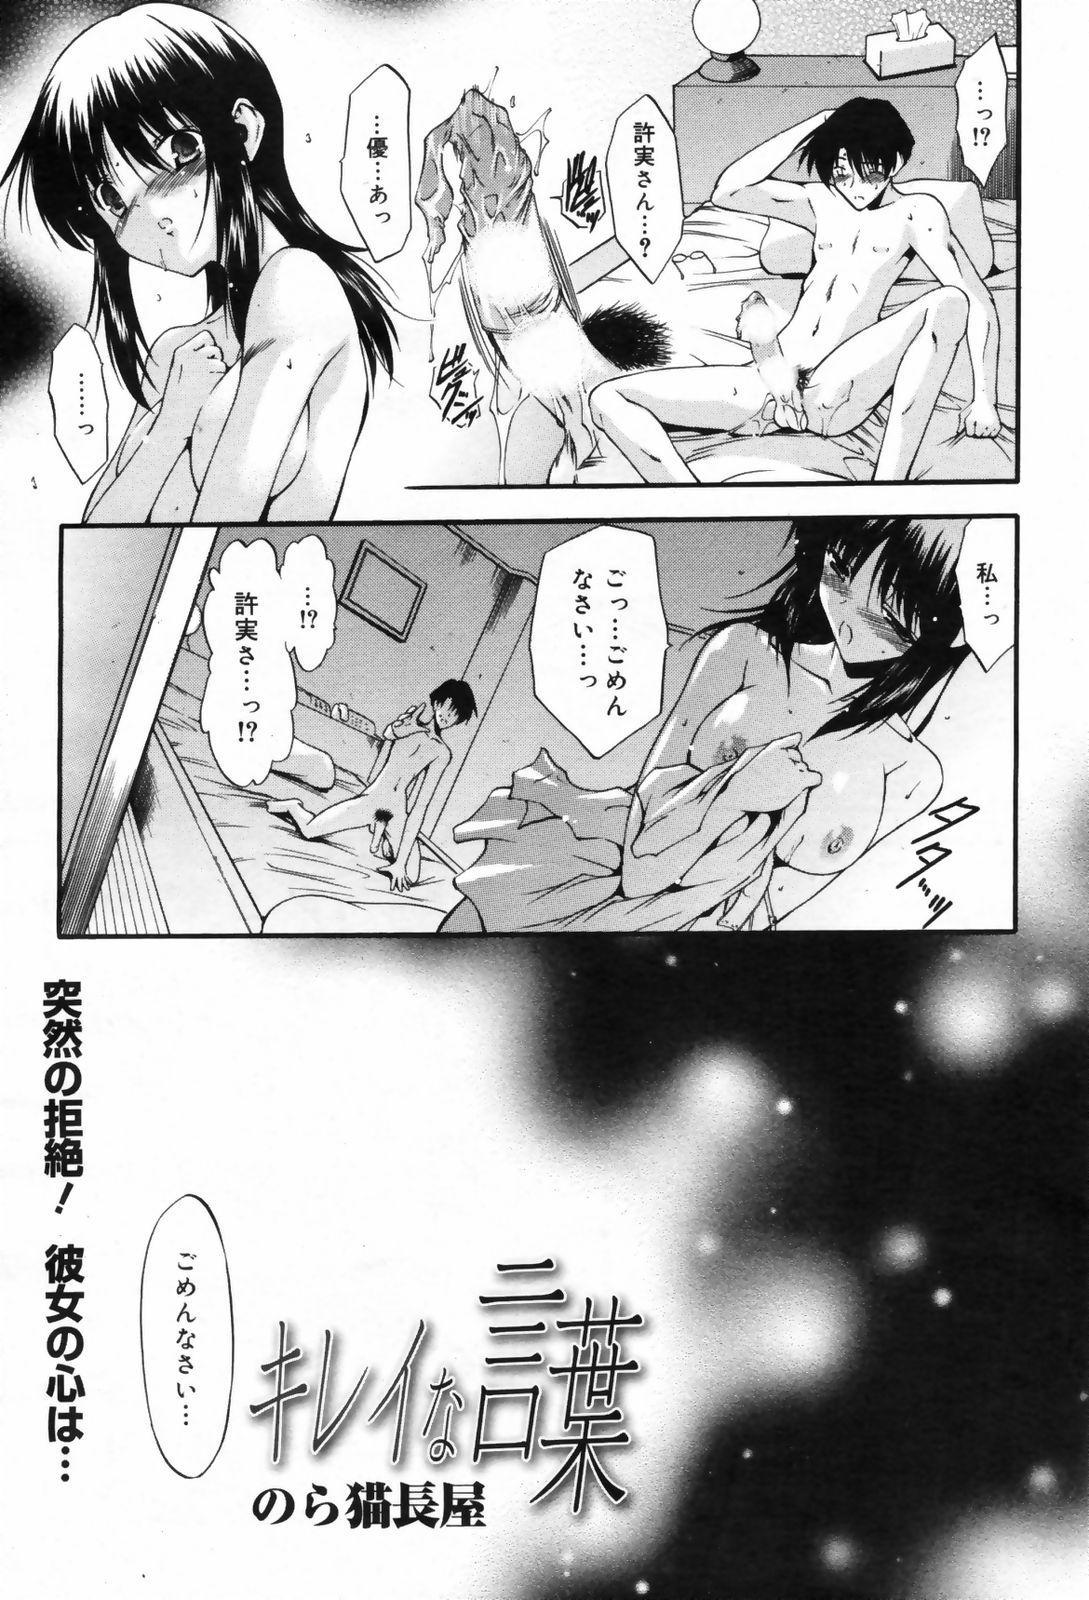 Manga Bangaichi 2009-02 Vol. 234 82